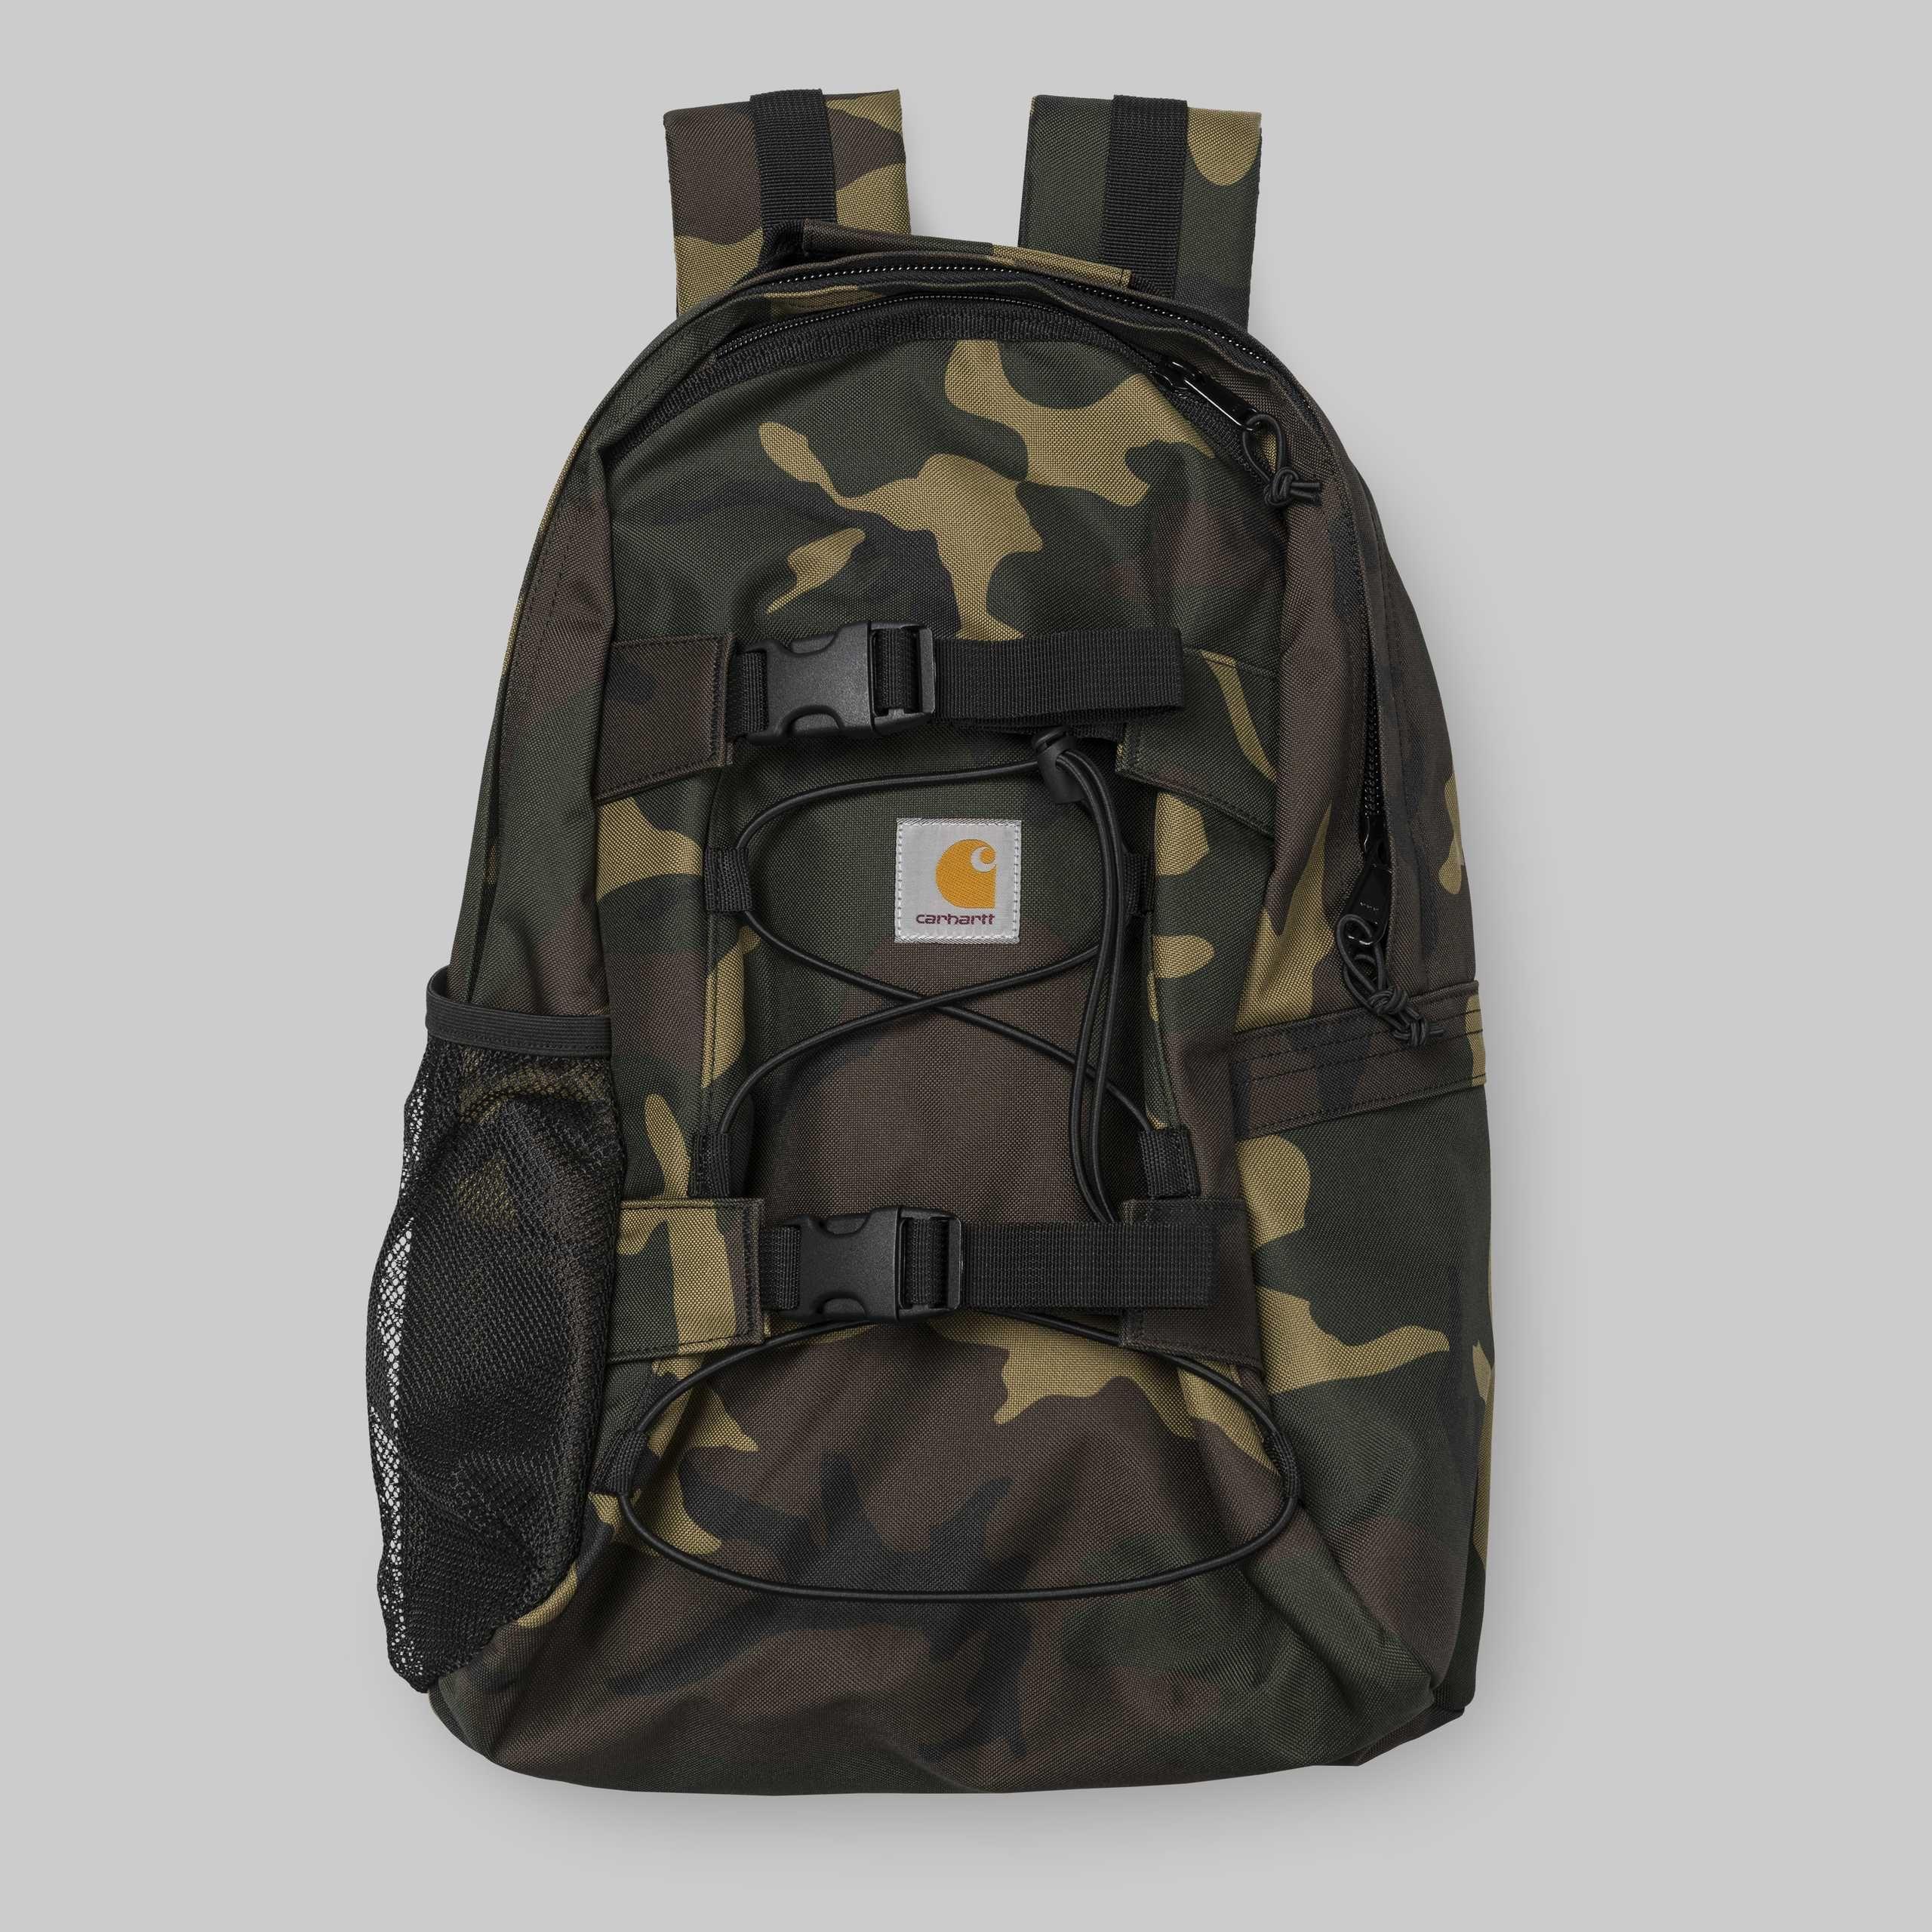 503e453c2c2cc7 Carhartt WIP Kickflip Backpack | carhartt-wip.com | Fashion: Bags ...